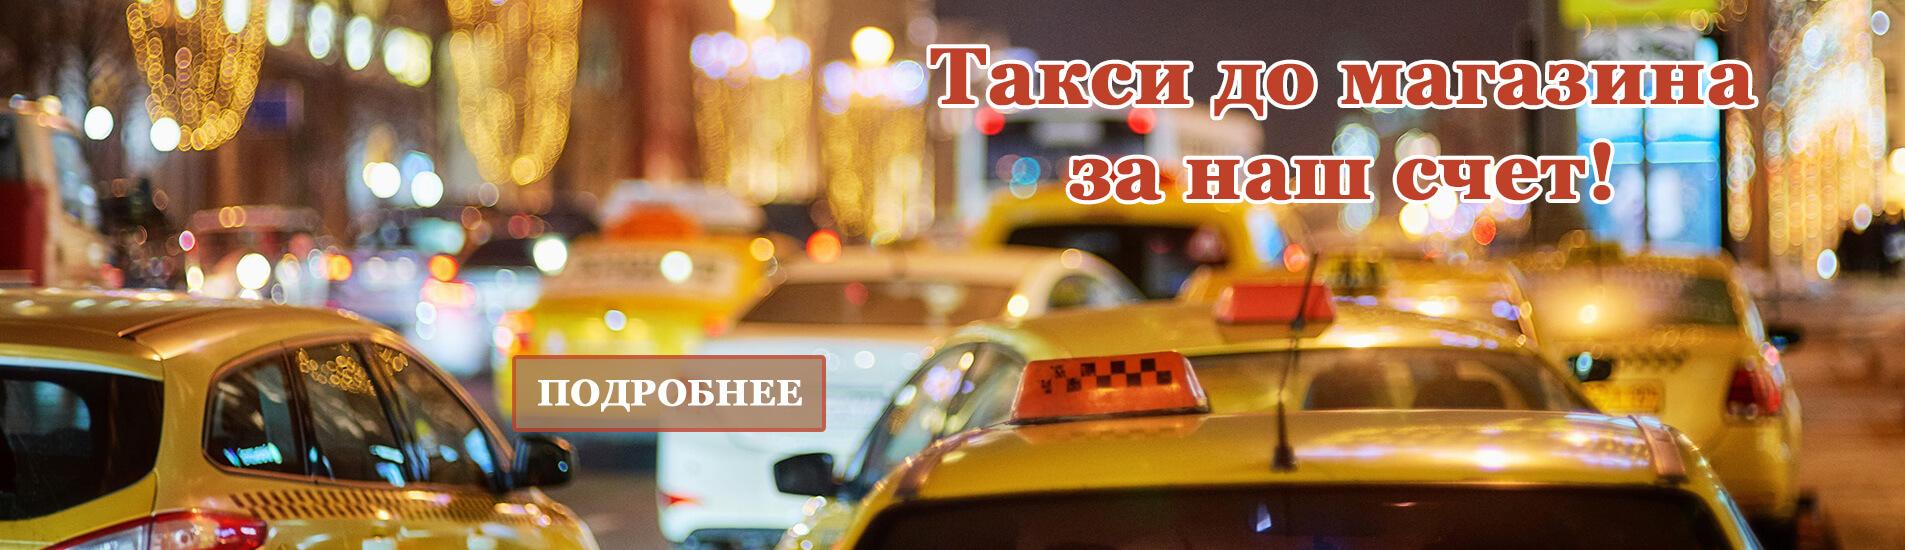 Такси бесплатно